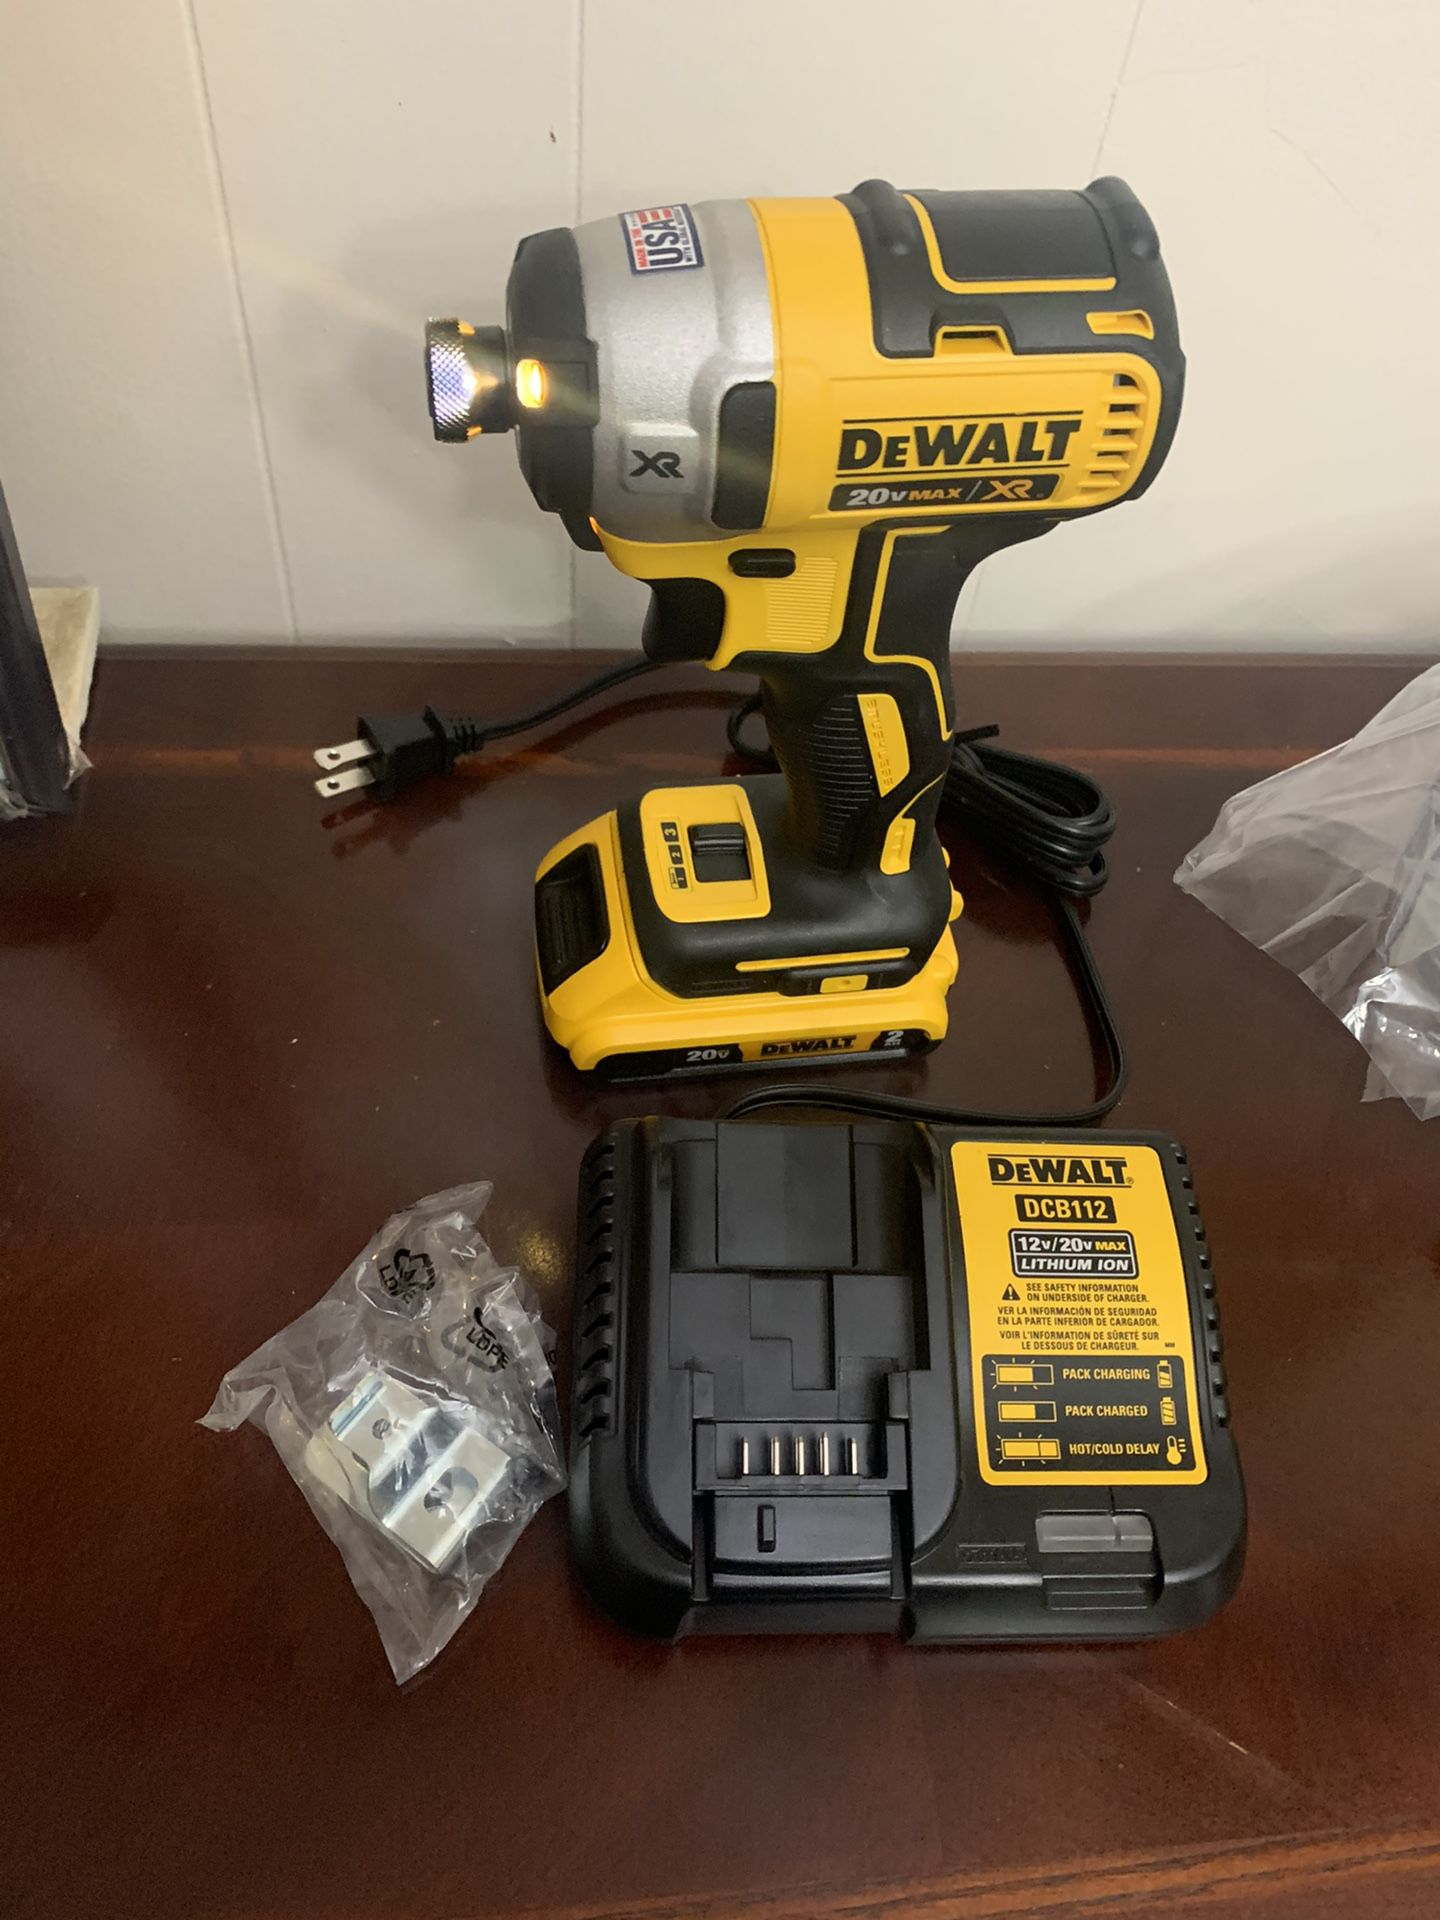 DEWALT 20v imapact xr 3-Speed brushles battery 2.0 and charger new